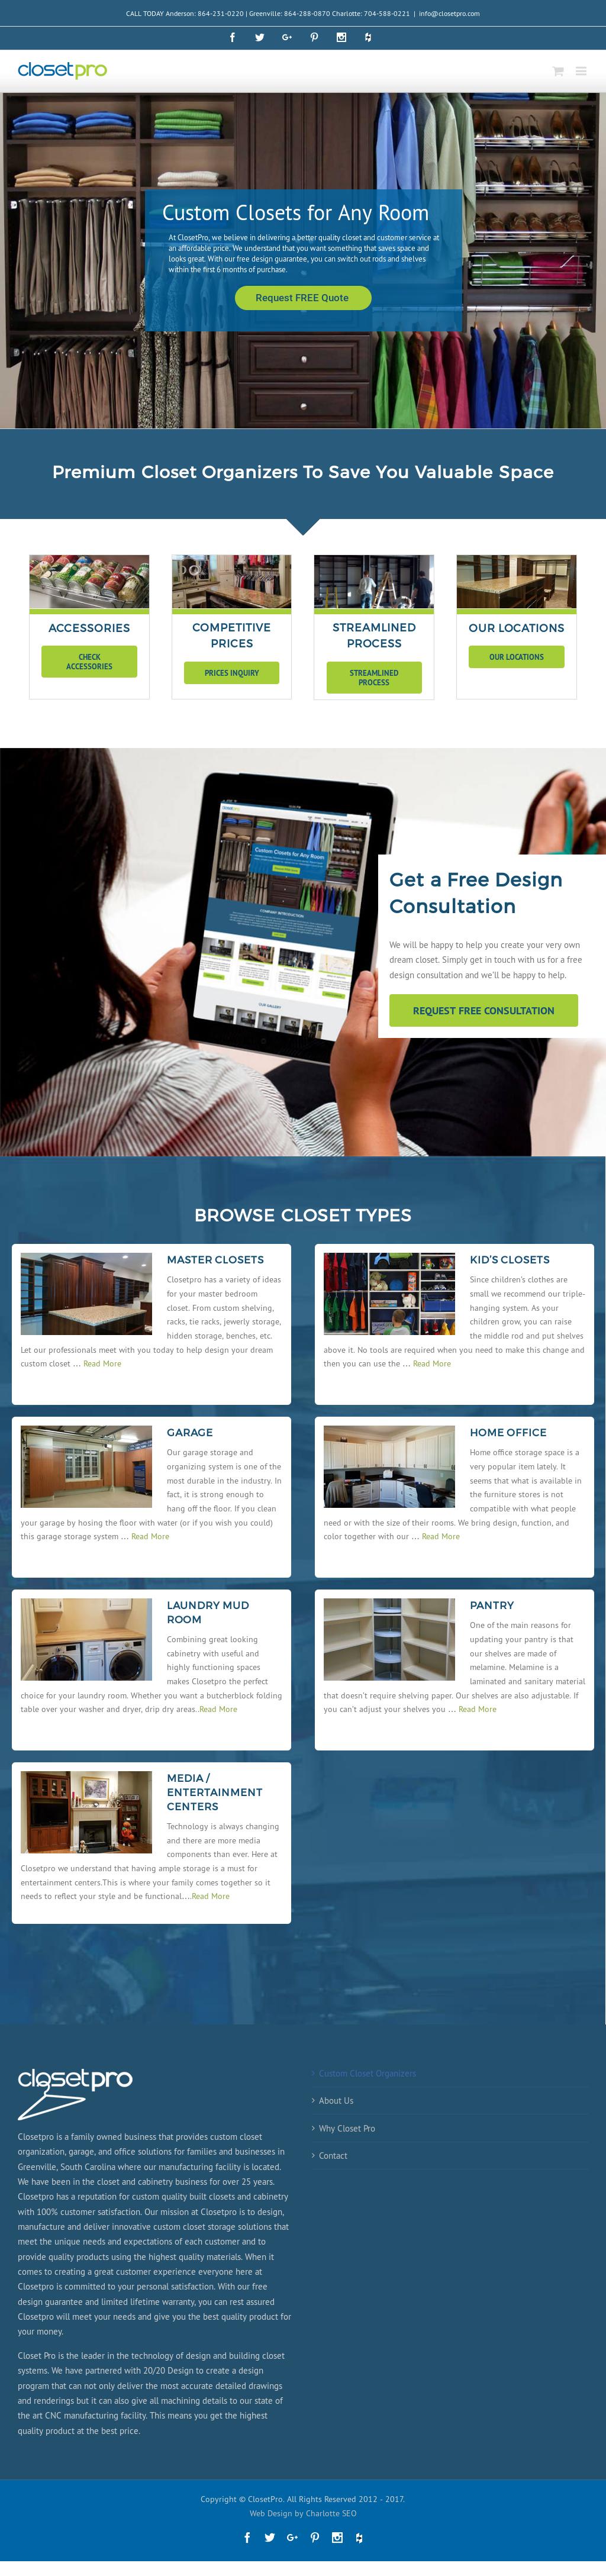 Atlanta Custom Closets Website History